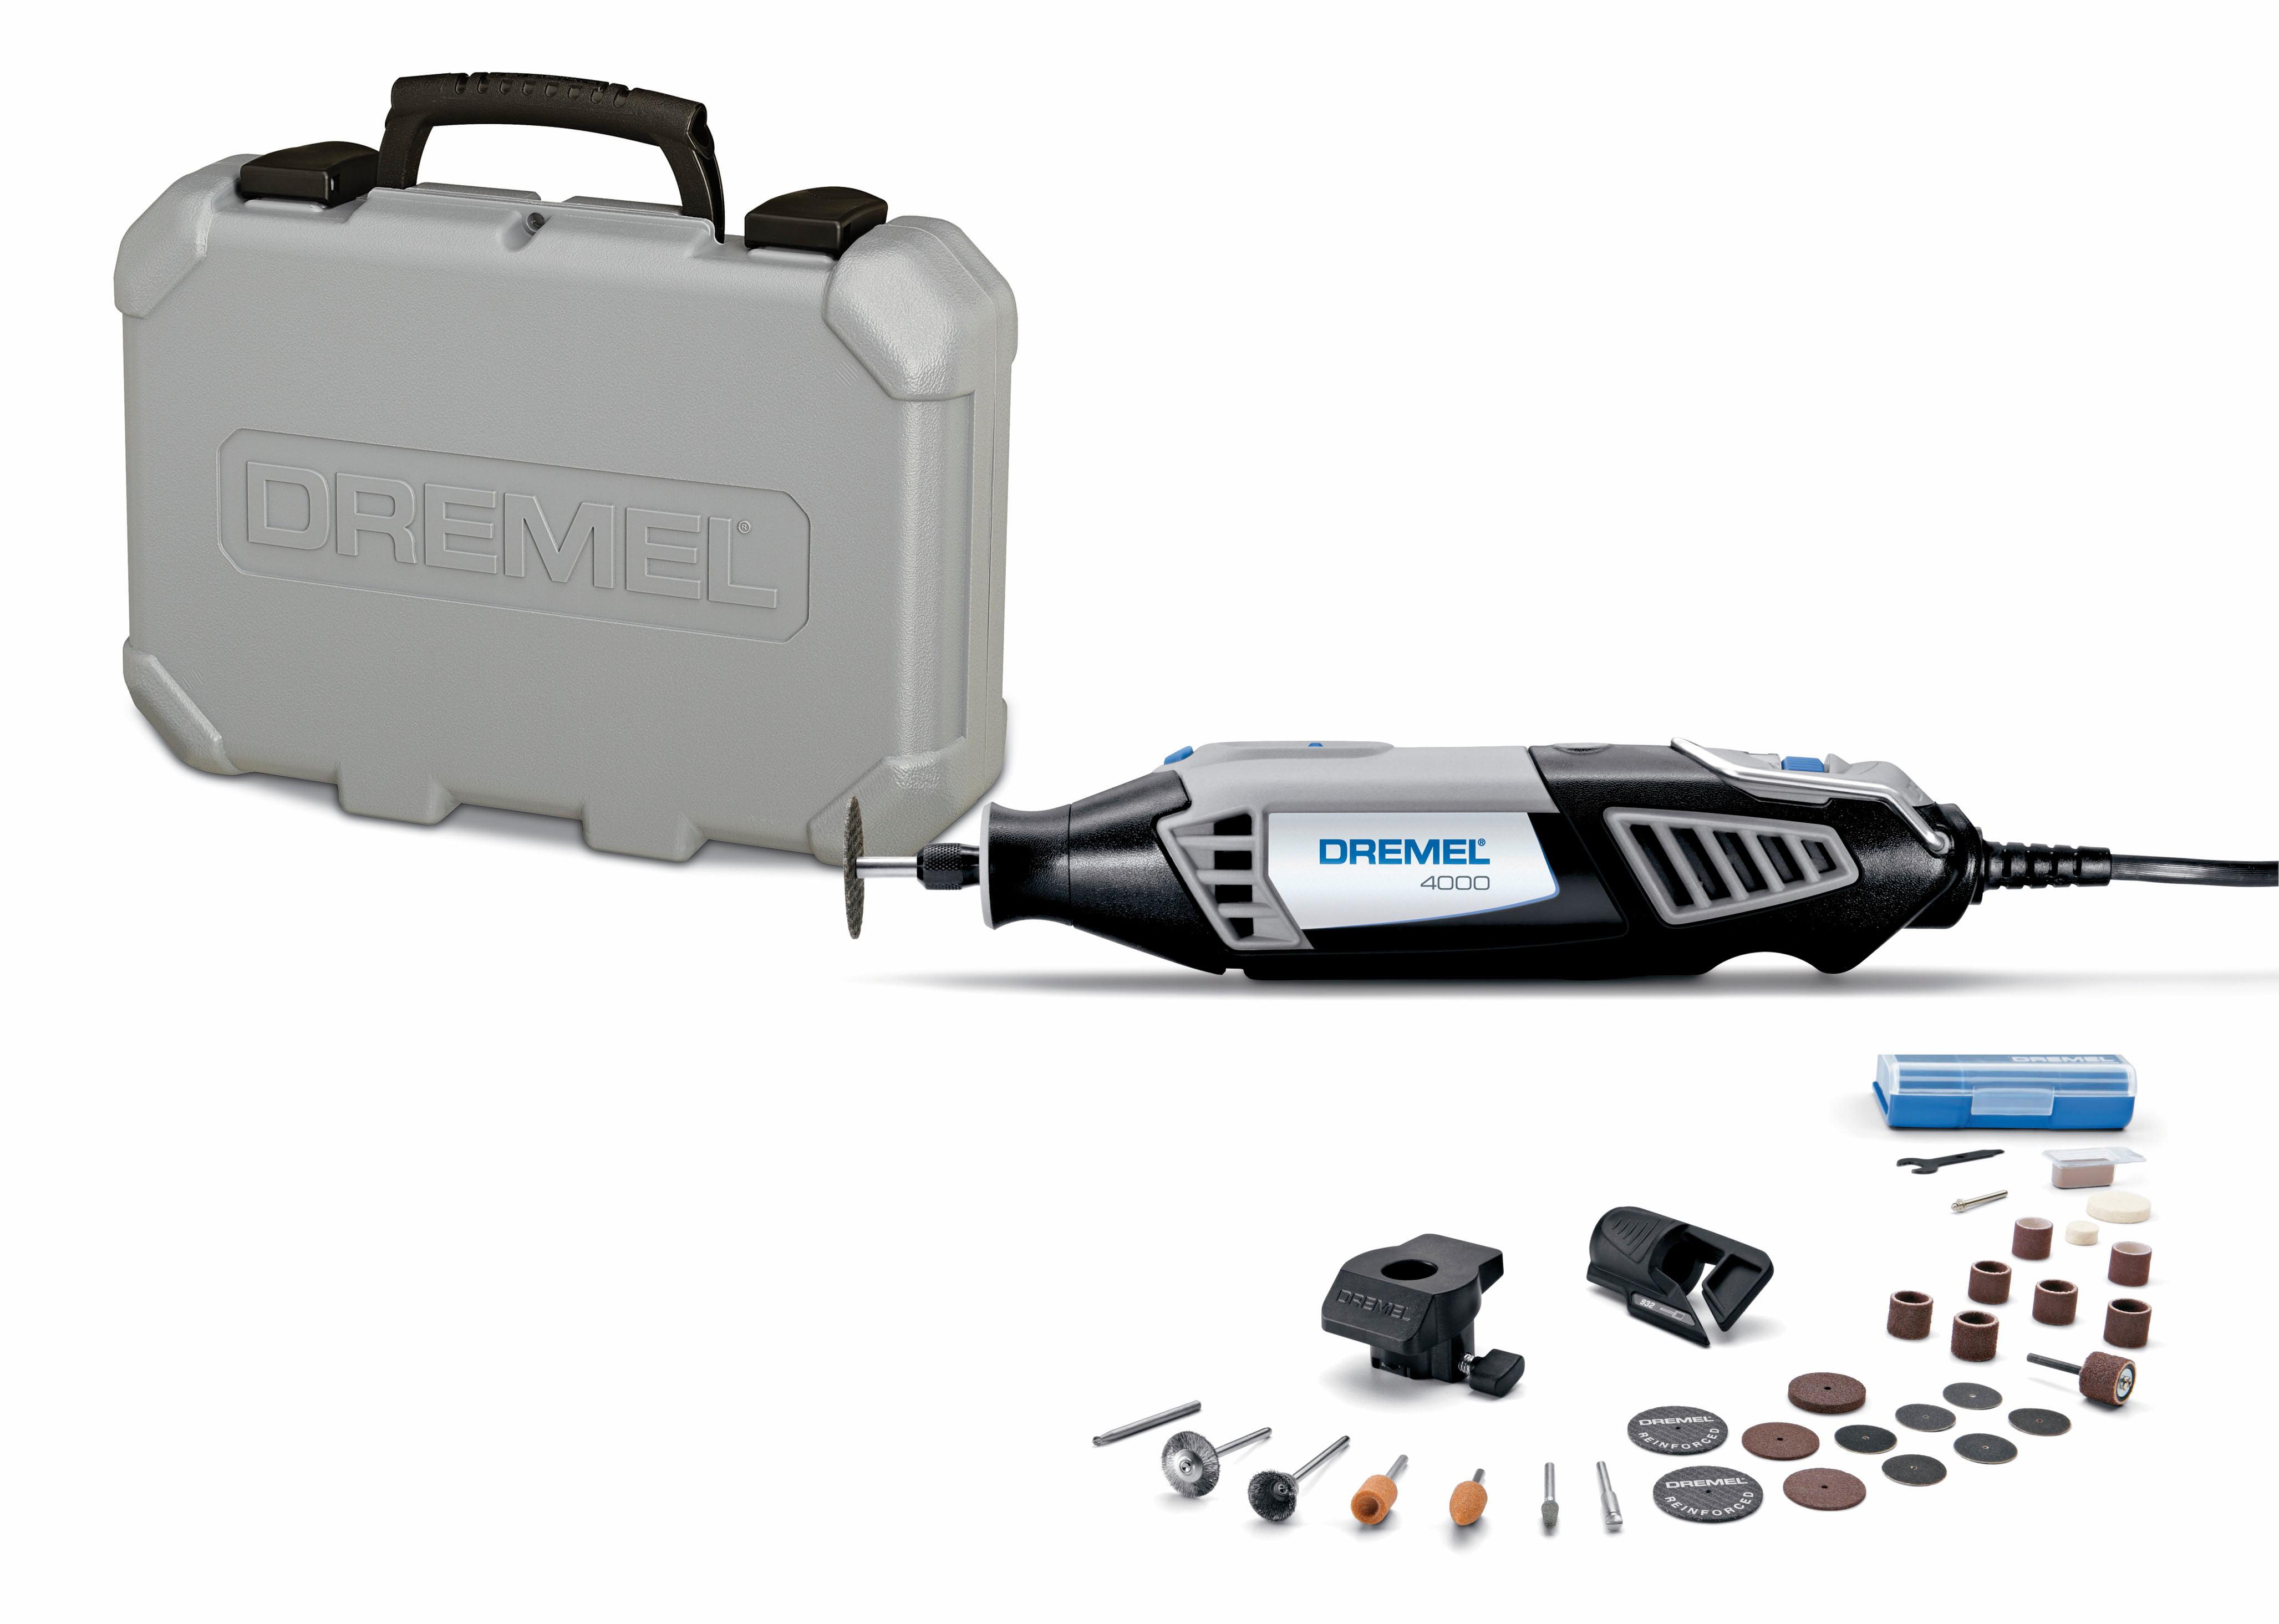 Dremel 4000-2 30 120-Volt Variable Speed Rotary Tool Kit by Robert Bosch Tool Corporation